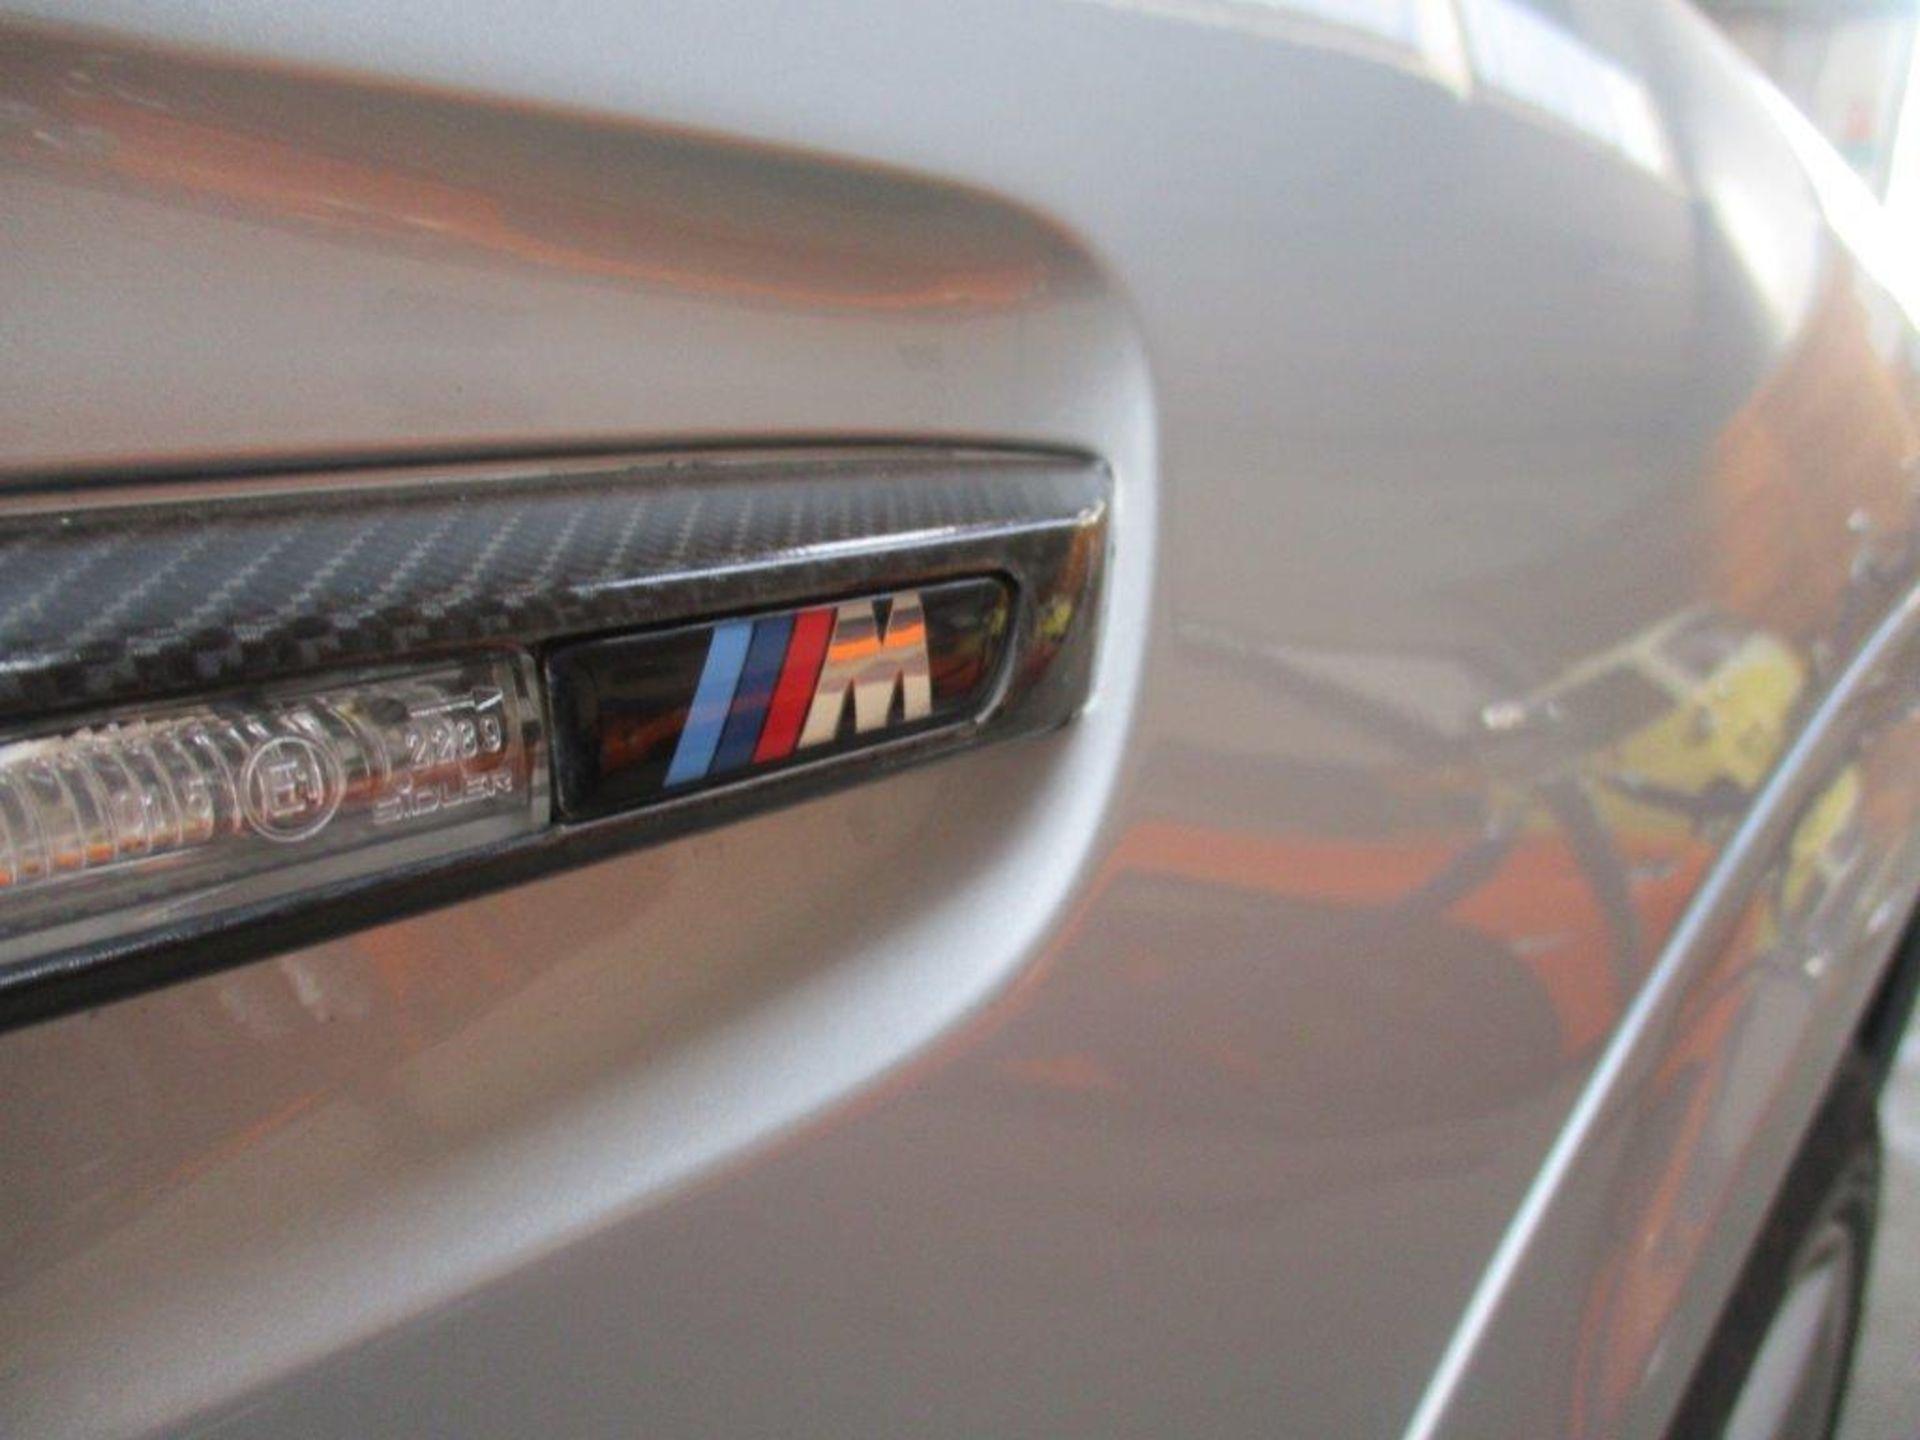 60 10 BMW X5 M Turbo Auto - Image 19 of 35